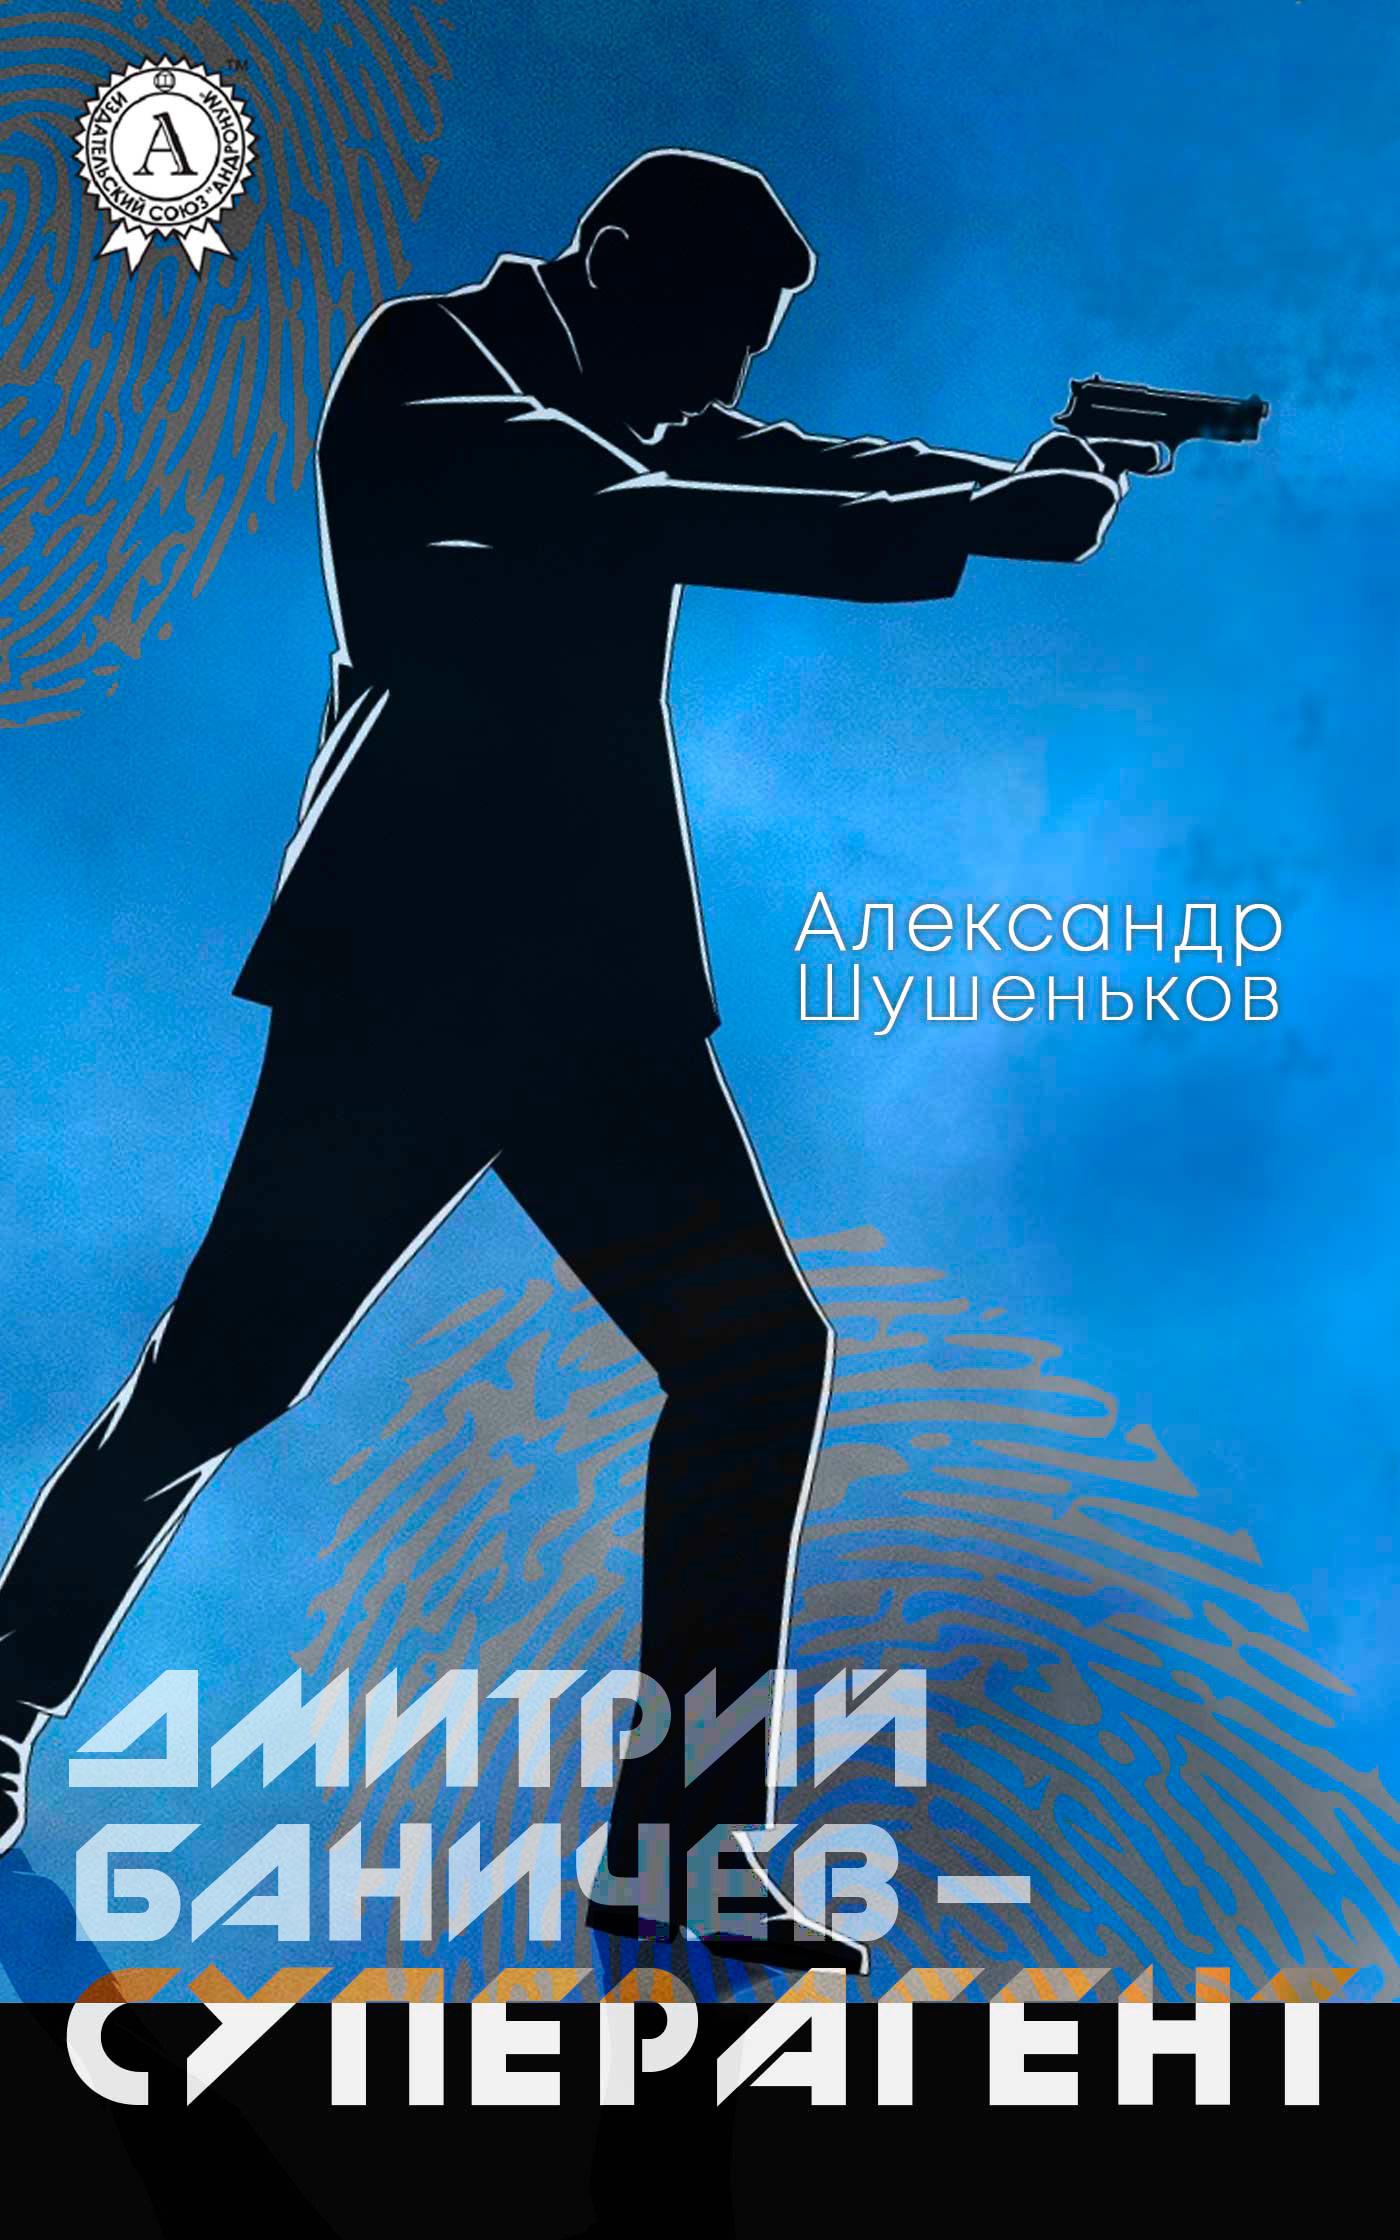 Александр Шушеньков «Дмитрий Баничев – суперагент»